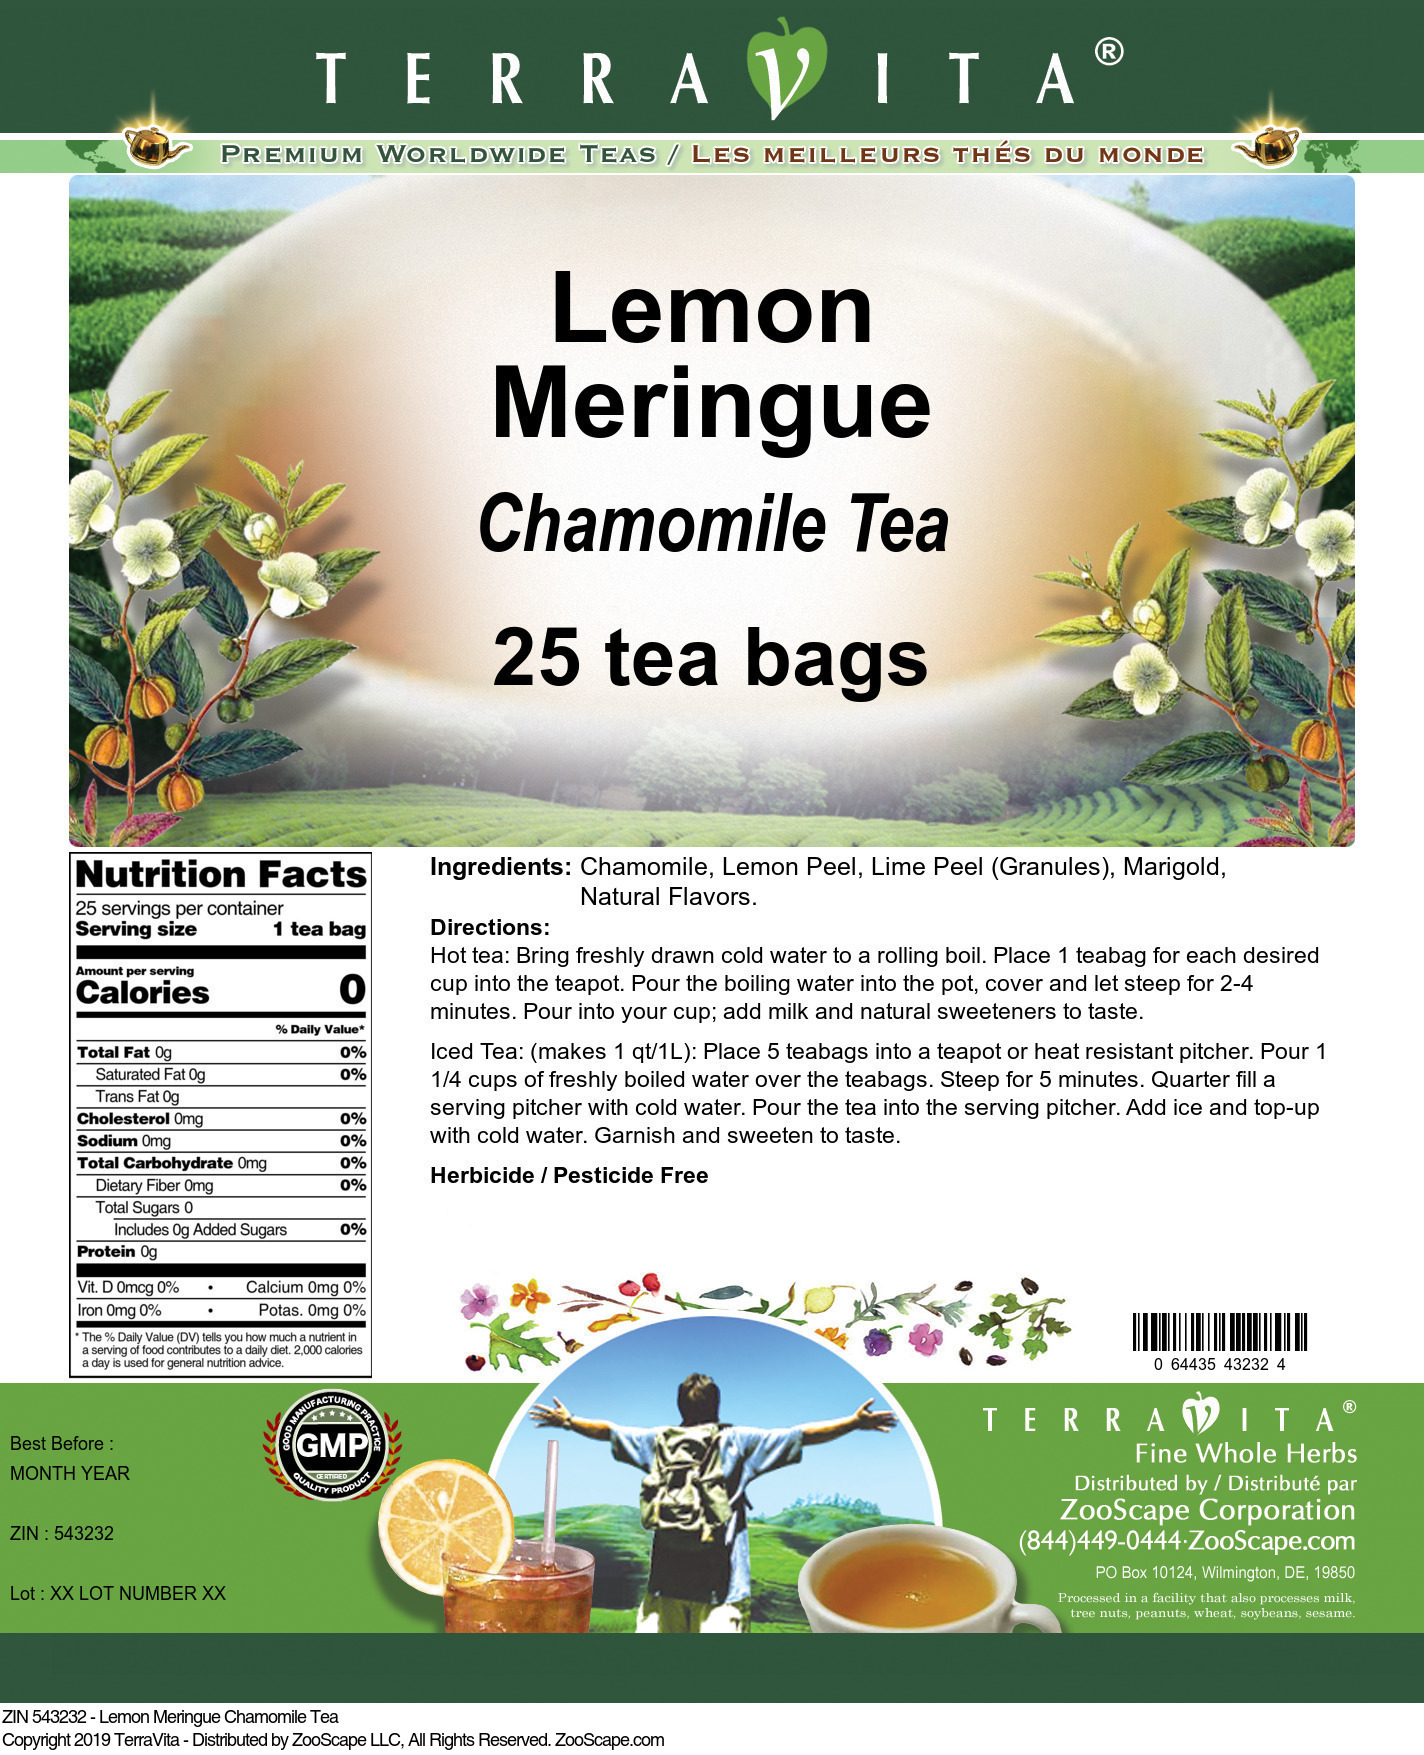 Lemon Meringue Chamomile Tea